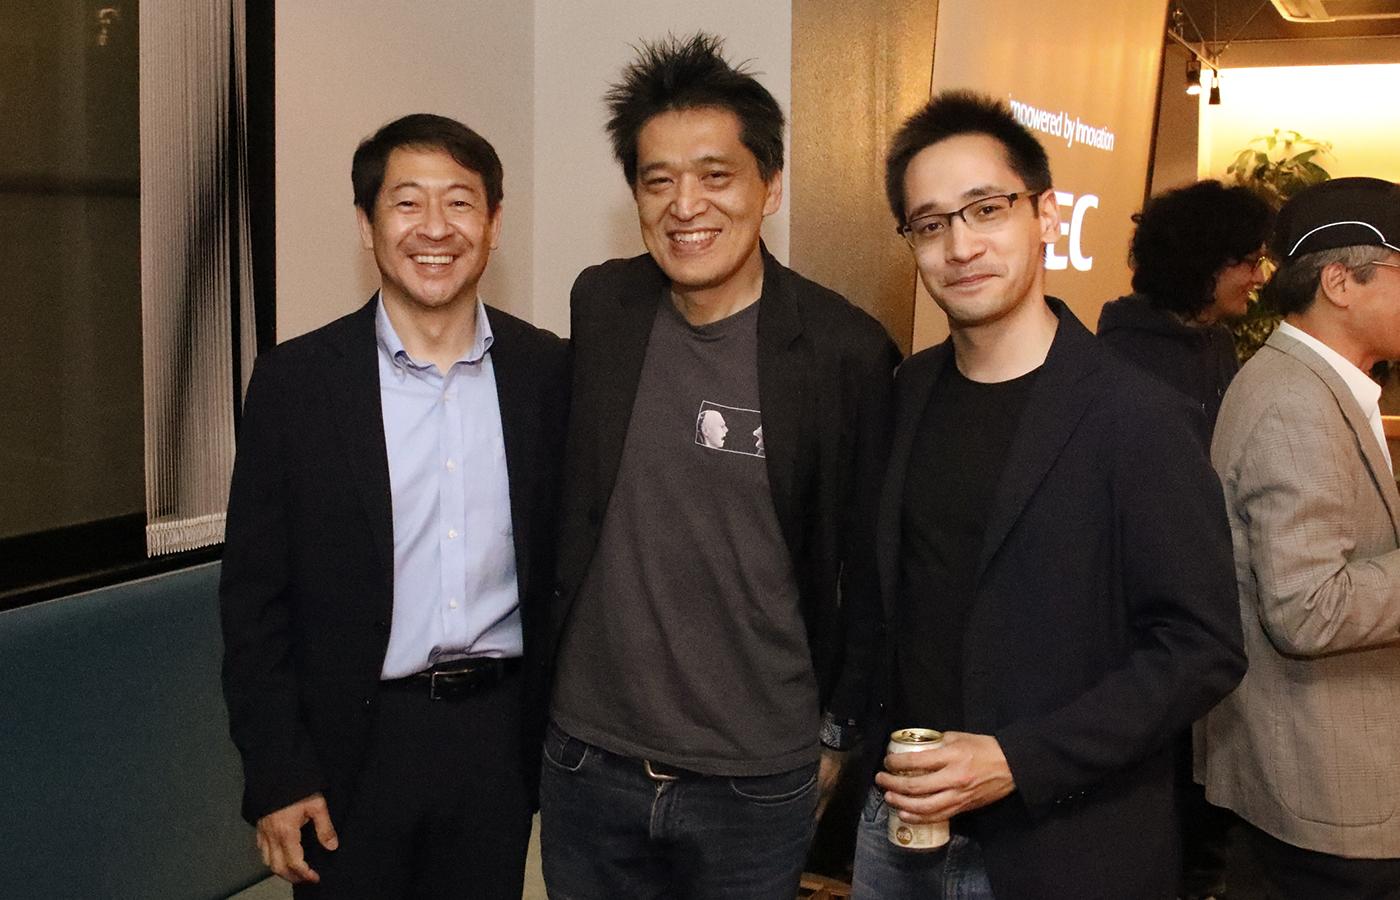 Katsunobu Suzuki, Takashi Ikegami and Olaf Witkowski